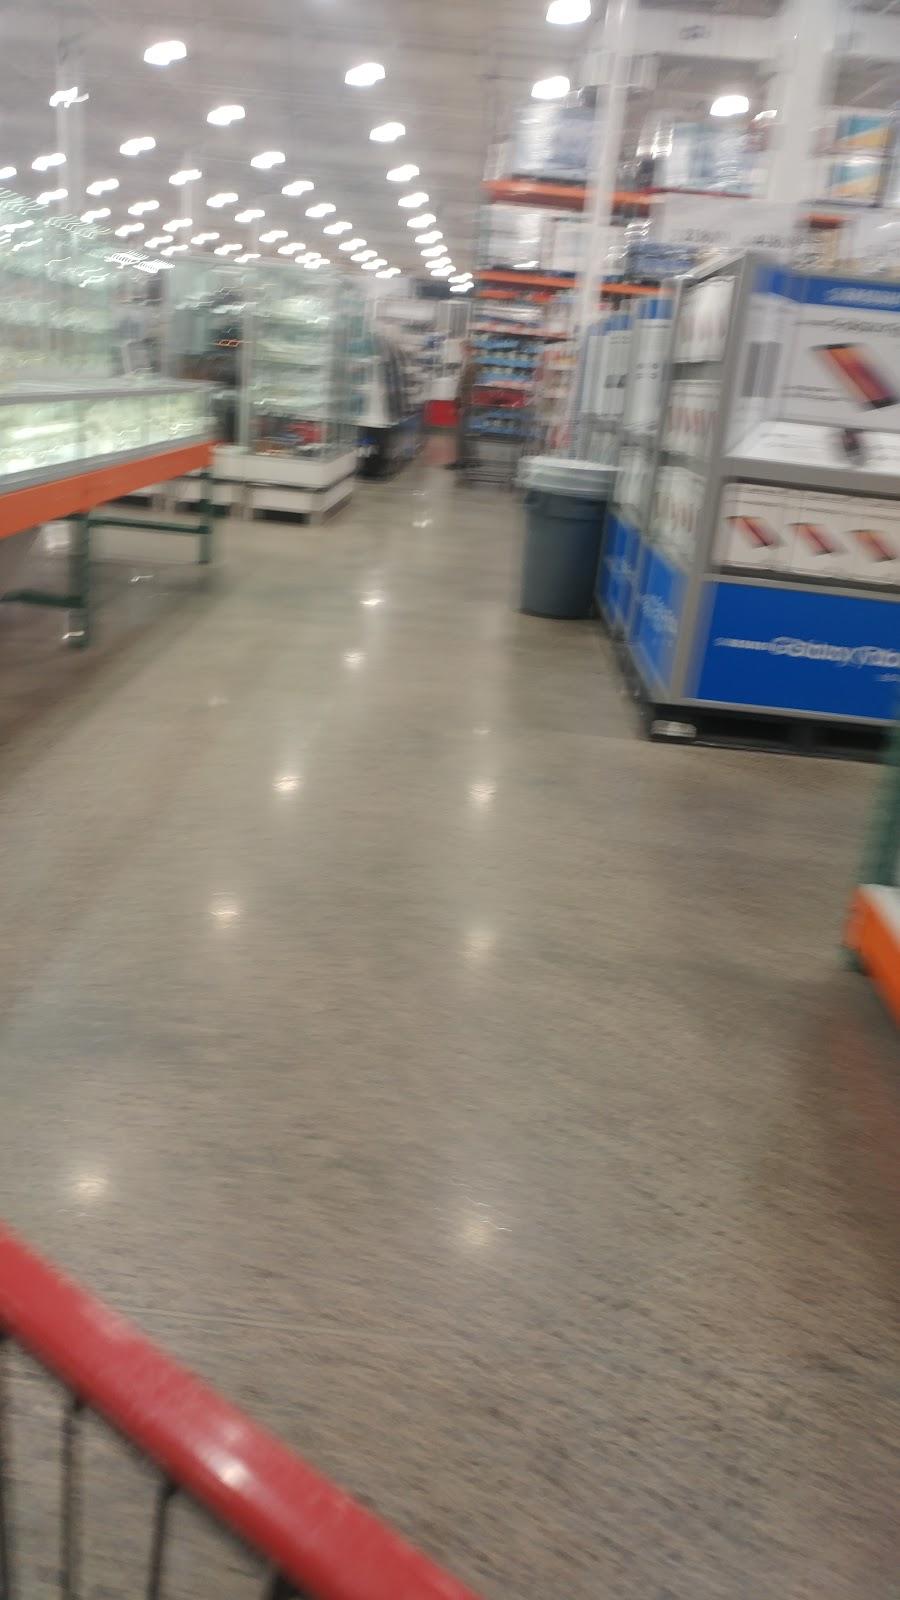 Costco Gas | gas station | 300 Bridge St, Montreal, QC H3K 2C3, Canada | 5149385170 OR +1 514-938-5170